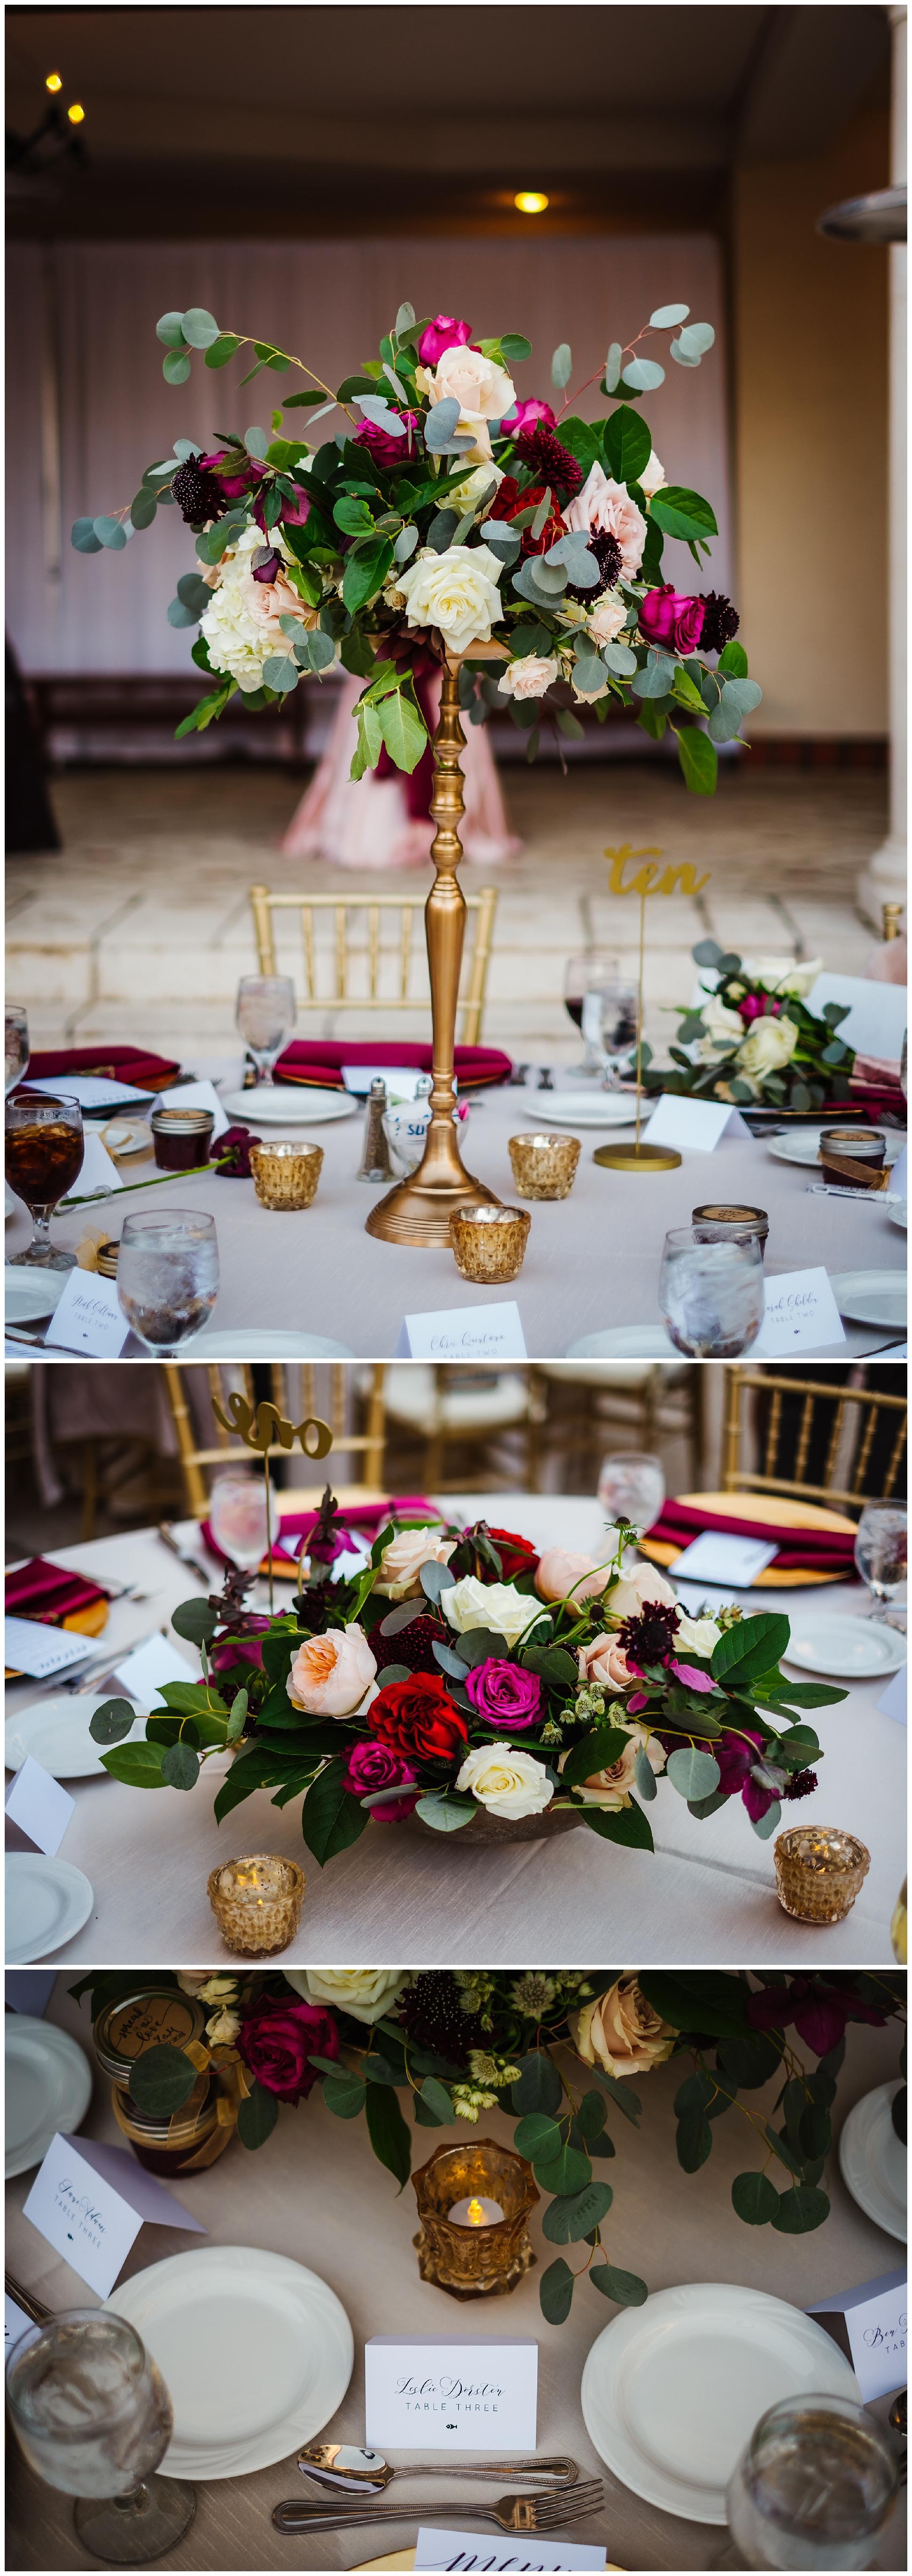 tampa-bradenton-wedding-photographer-south-florida-museum-classic-blush-gold-alpacas-sparklers_0068.jpg